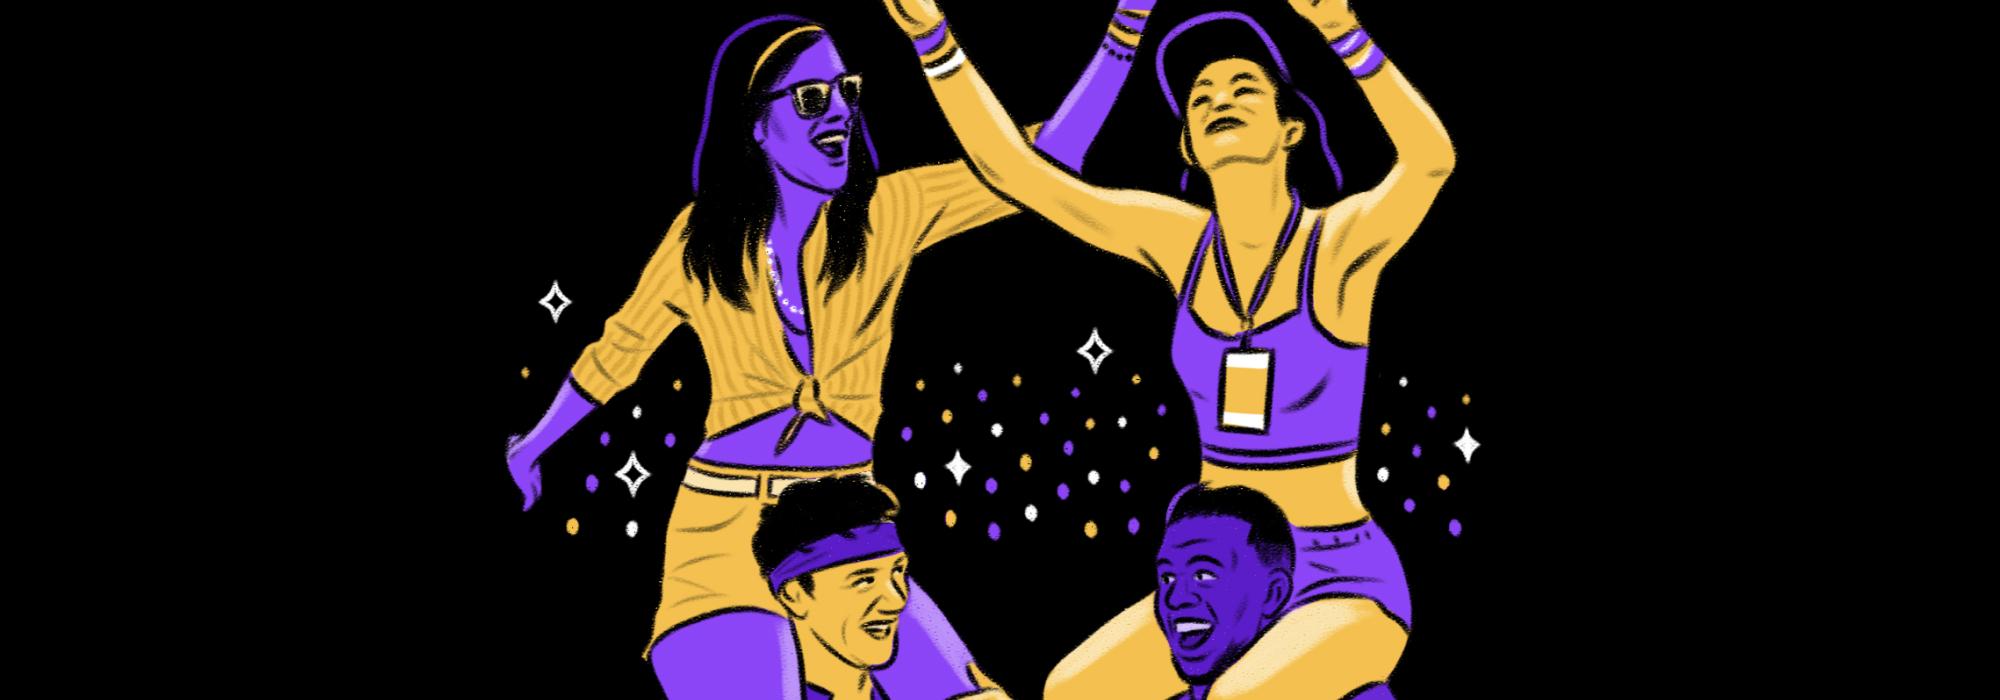 A Summerland Tour live event